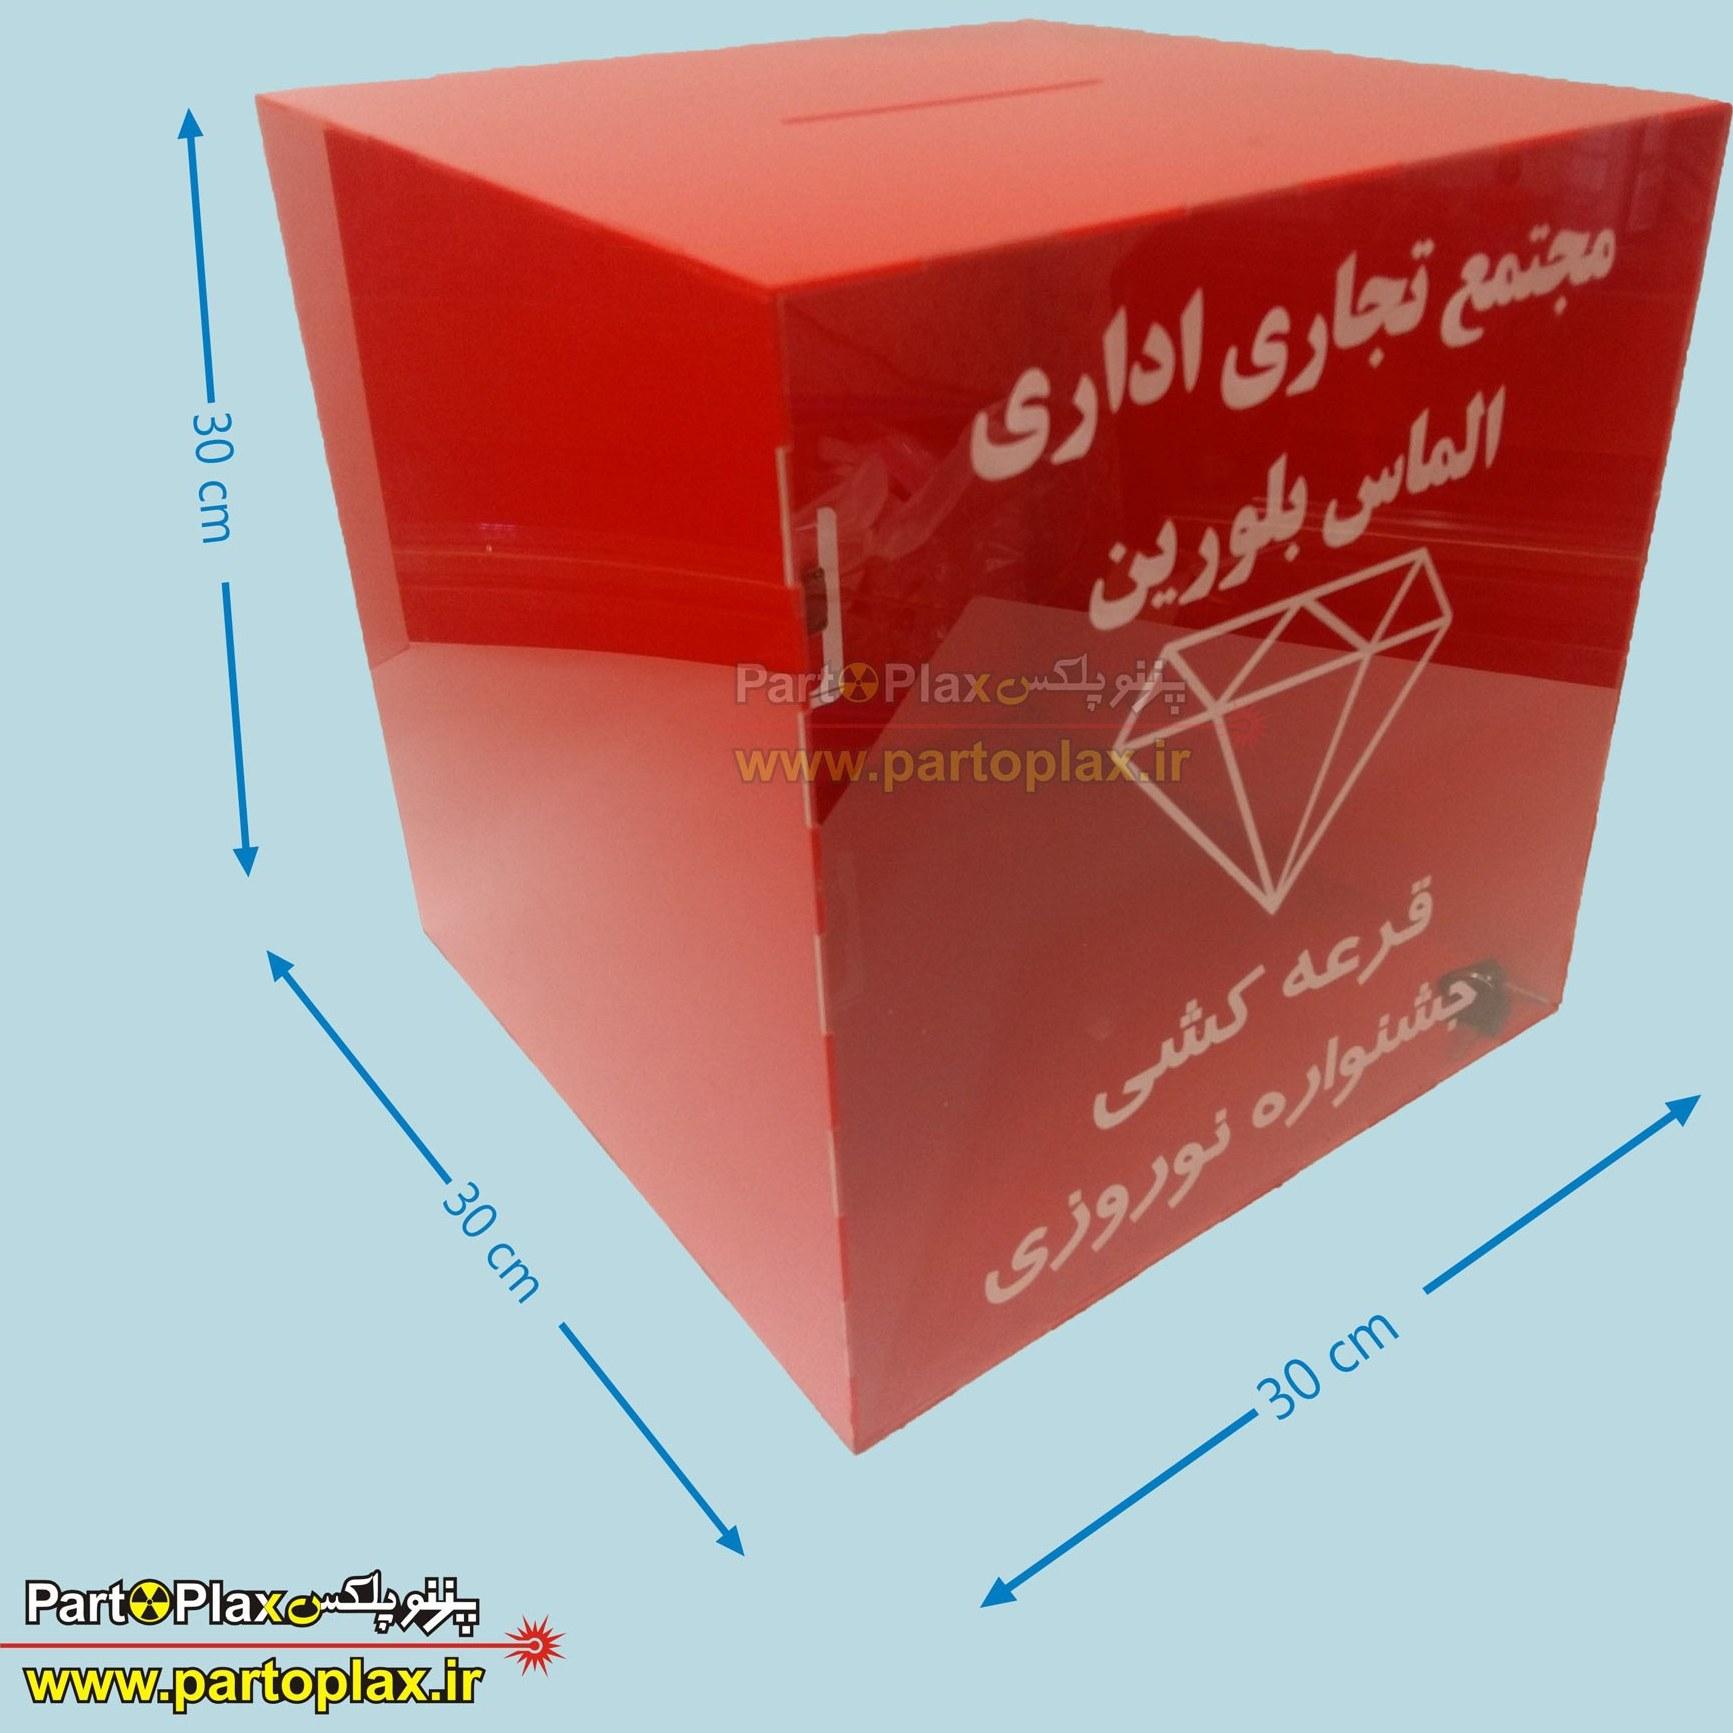 image باکس شیشه ای